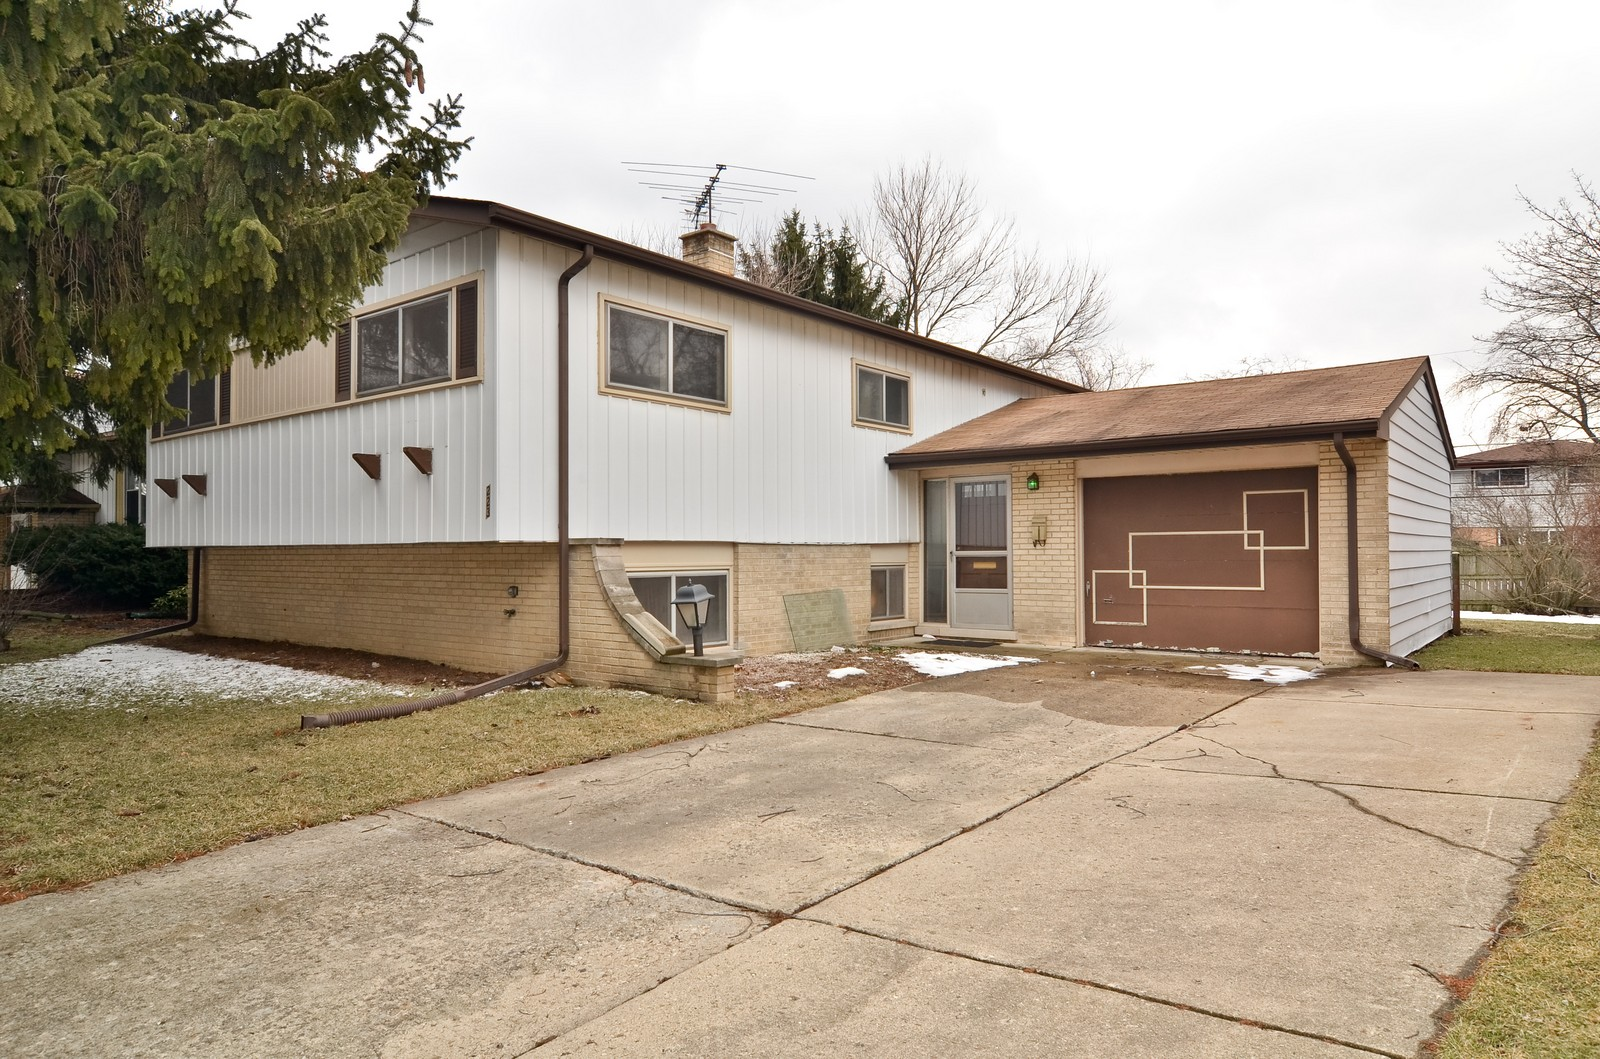 Real Estate Photography - 223 Norman Ct, Des Plaines, IL, 60016 - Front View